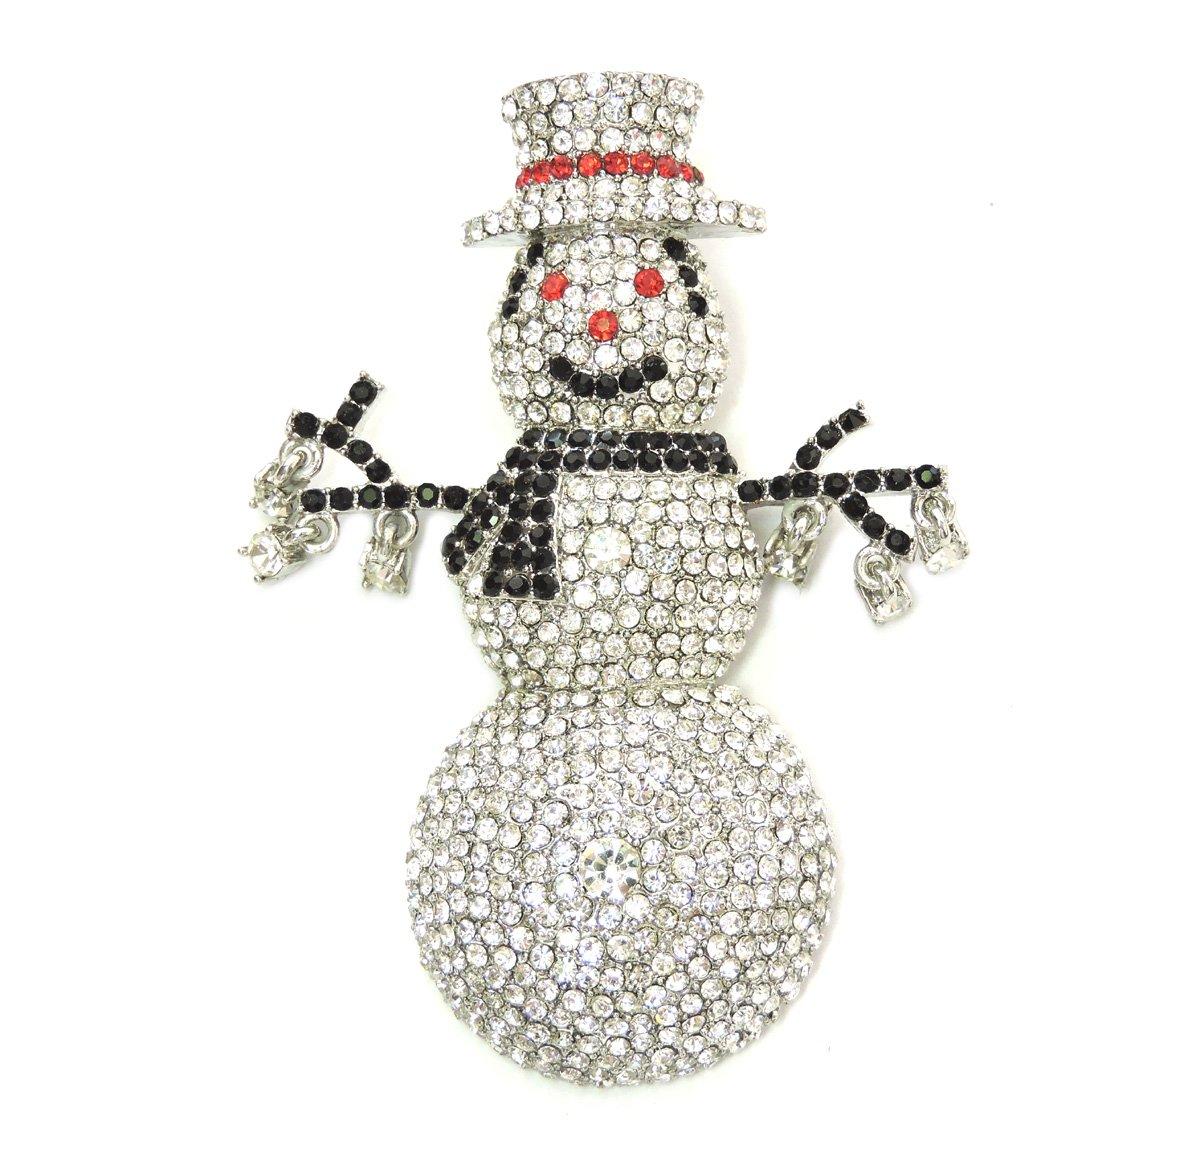 Faship Snowman Pin Brooch Gorgeous Crystal Tall Big